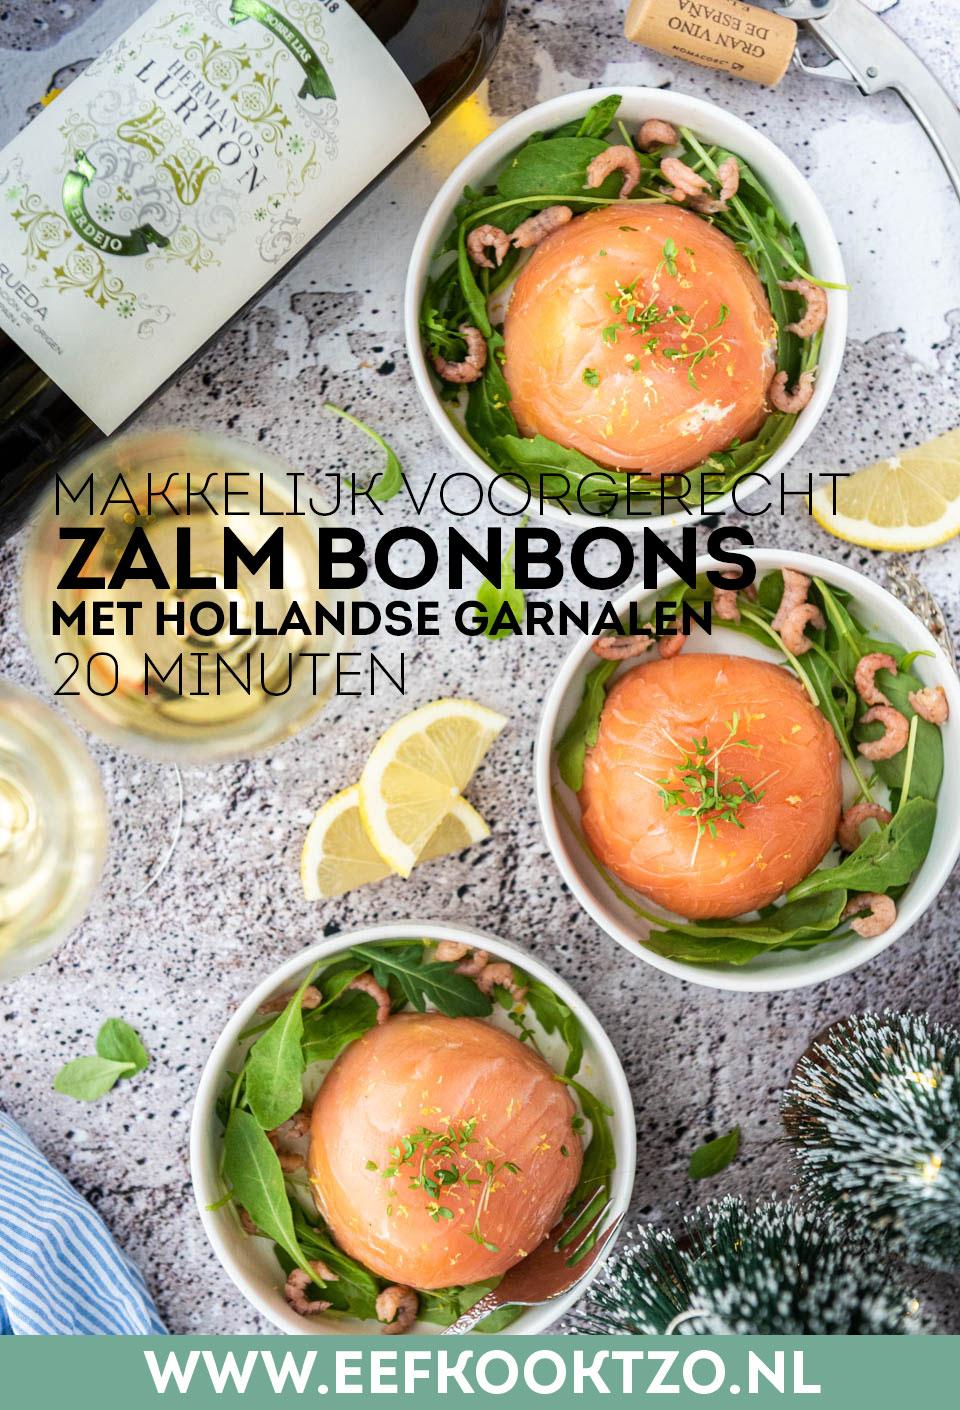 Zalm bonbons Pinterest Collage